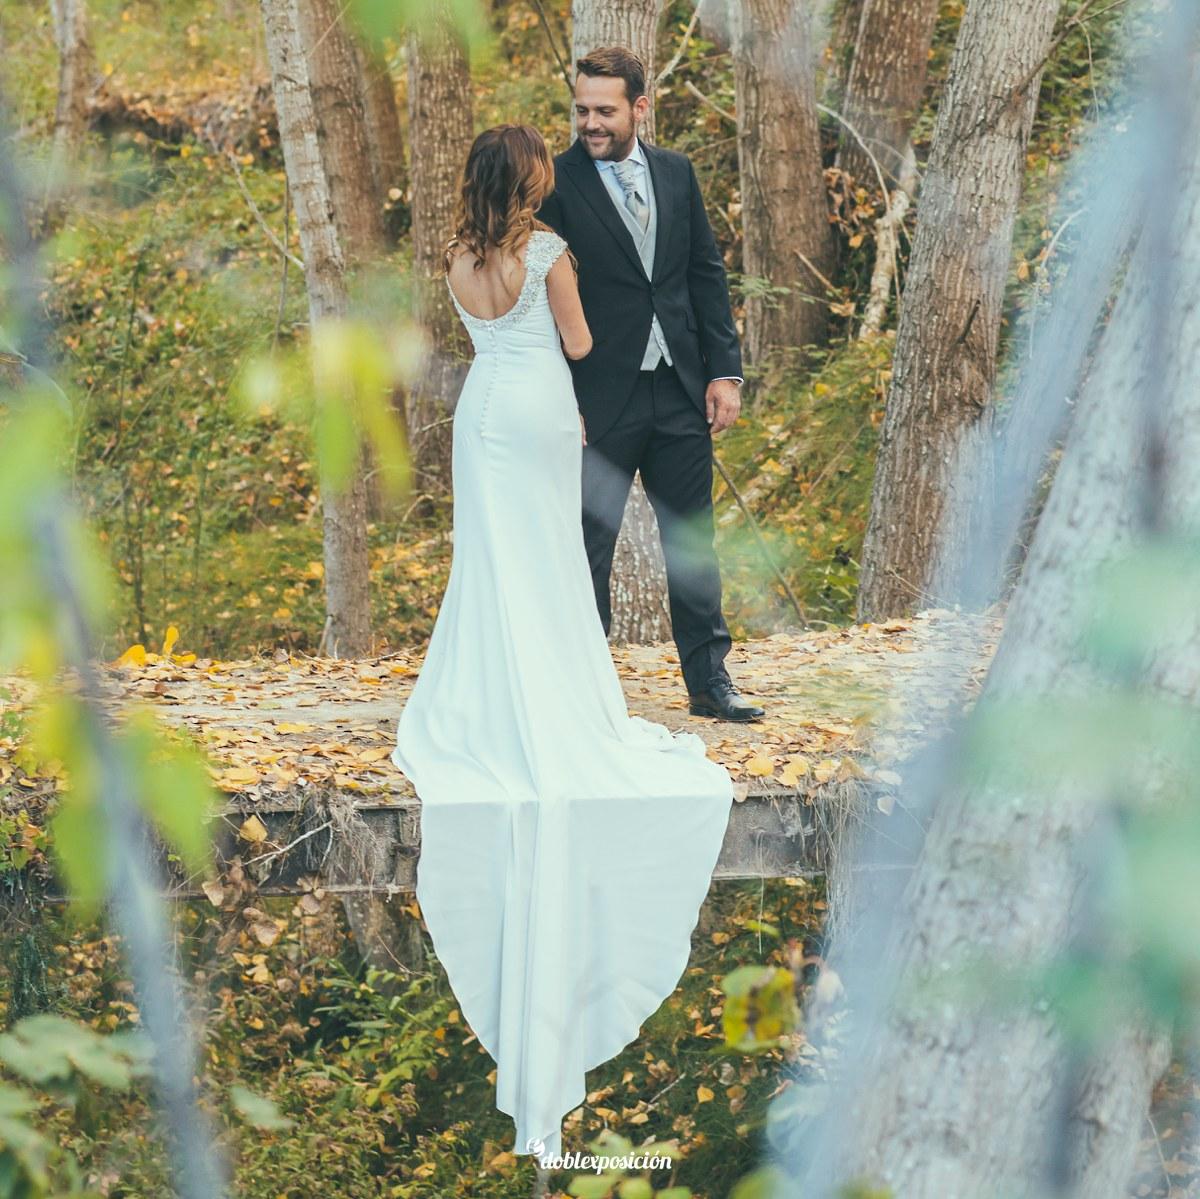 fotografos-boda-elche-alicante-reportaje-bosque-postboda-0010